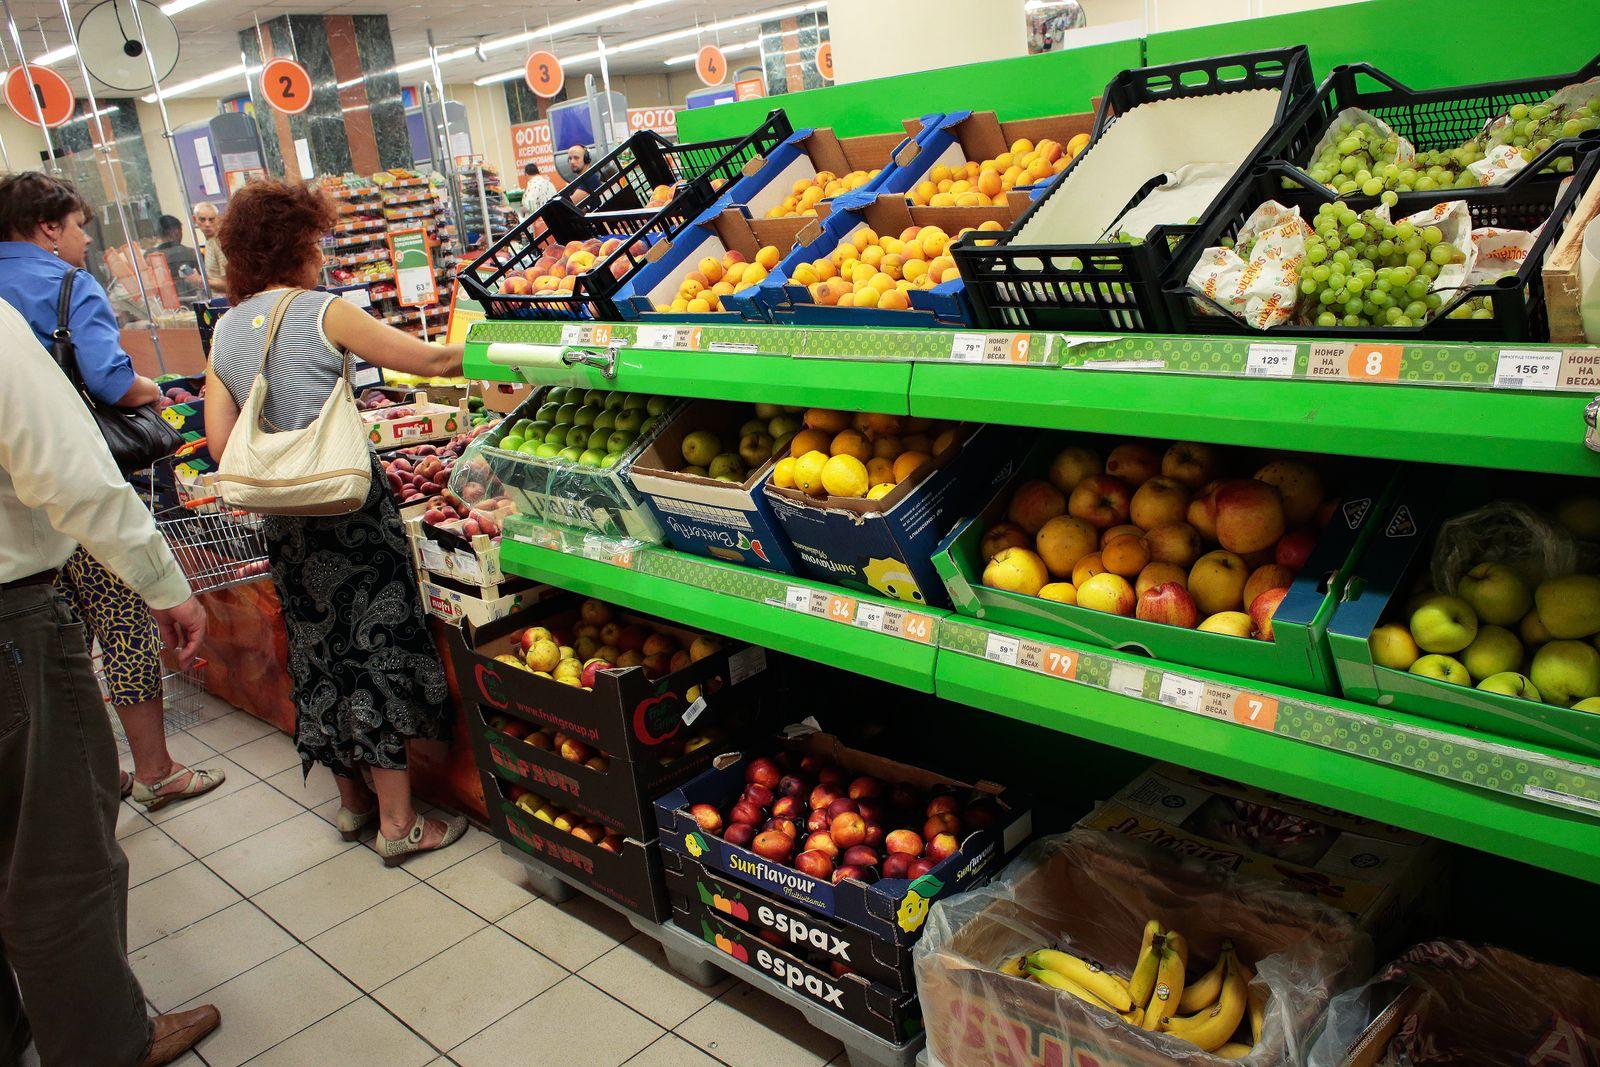 Ruassland / Obst / Gemüse / Markt / Import